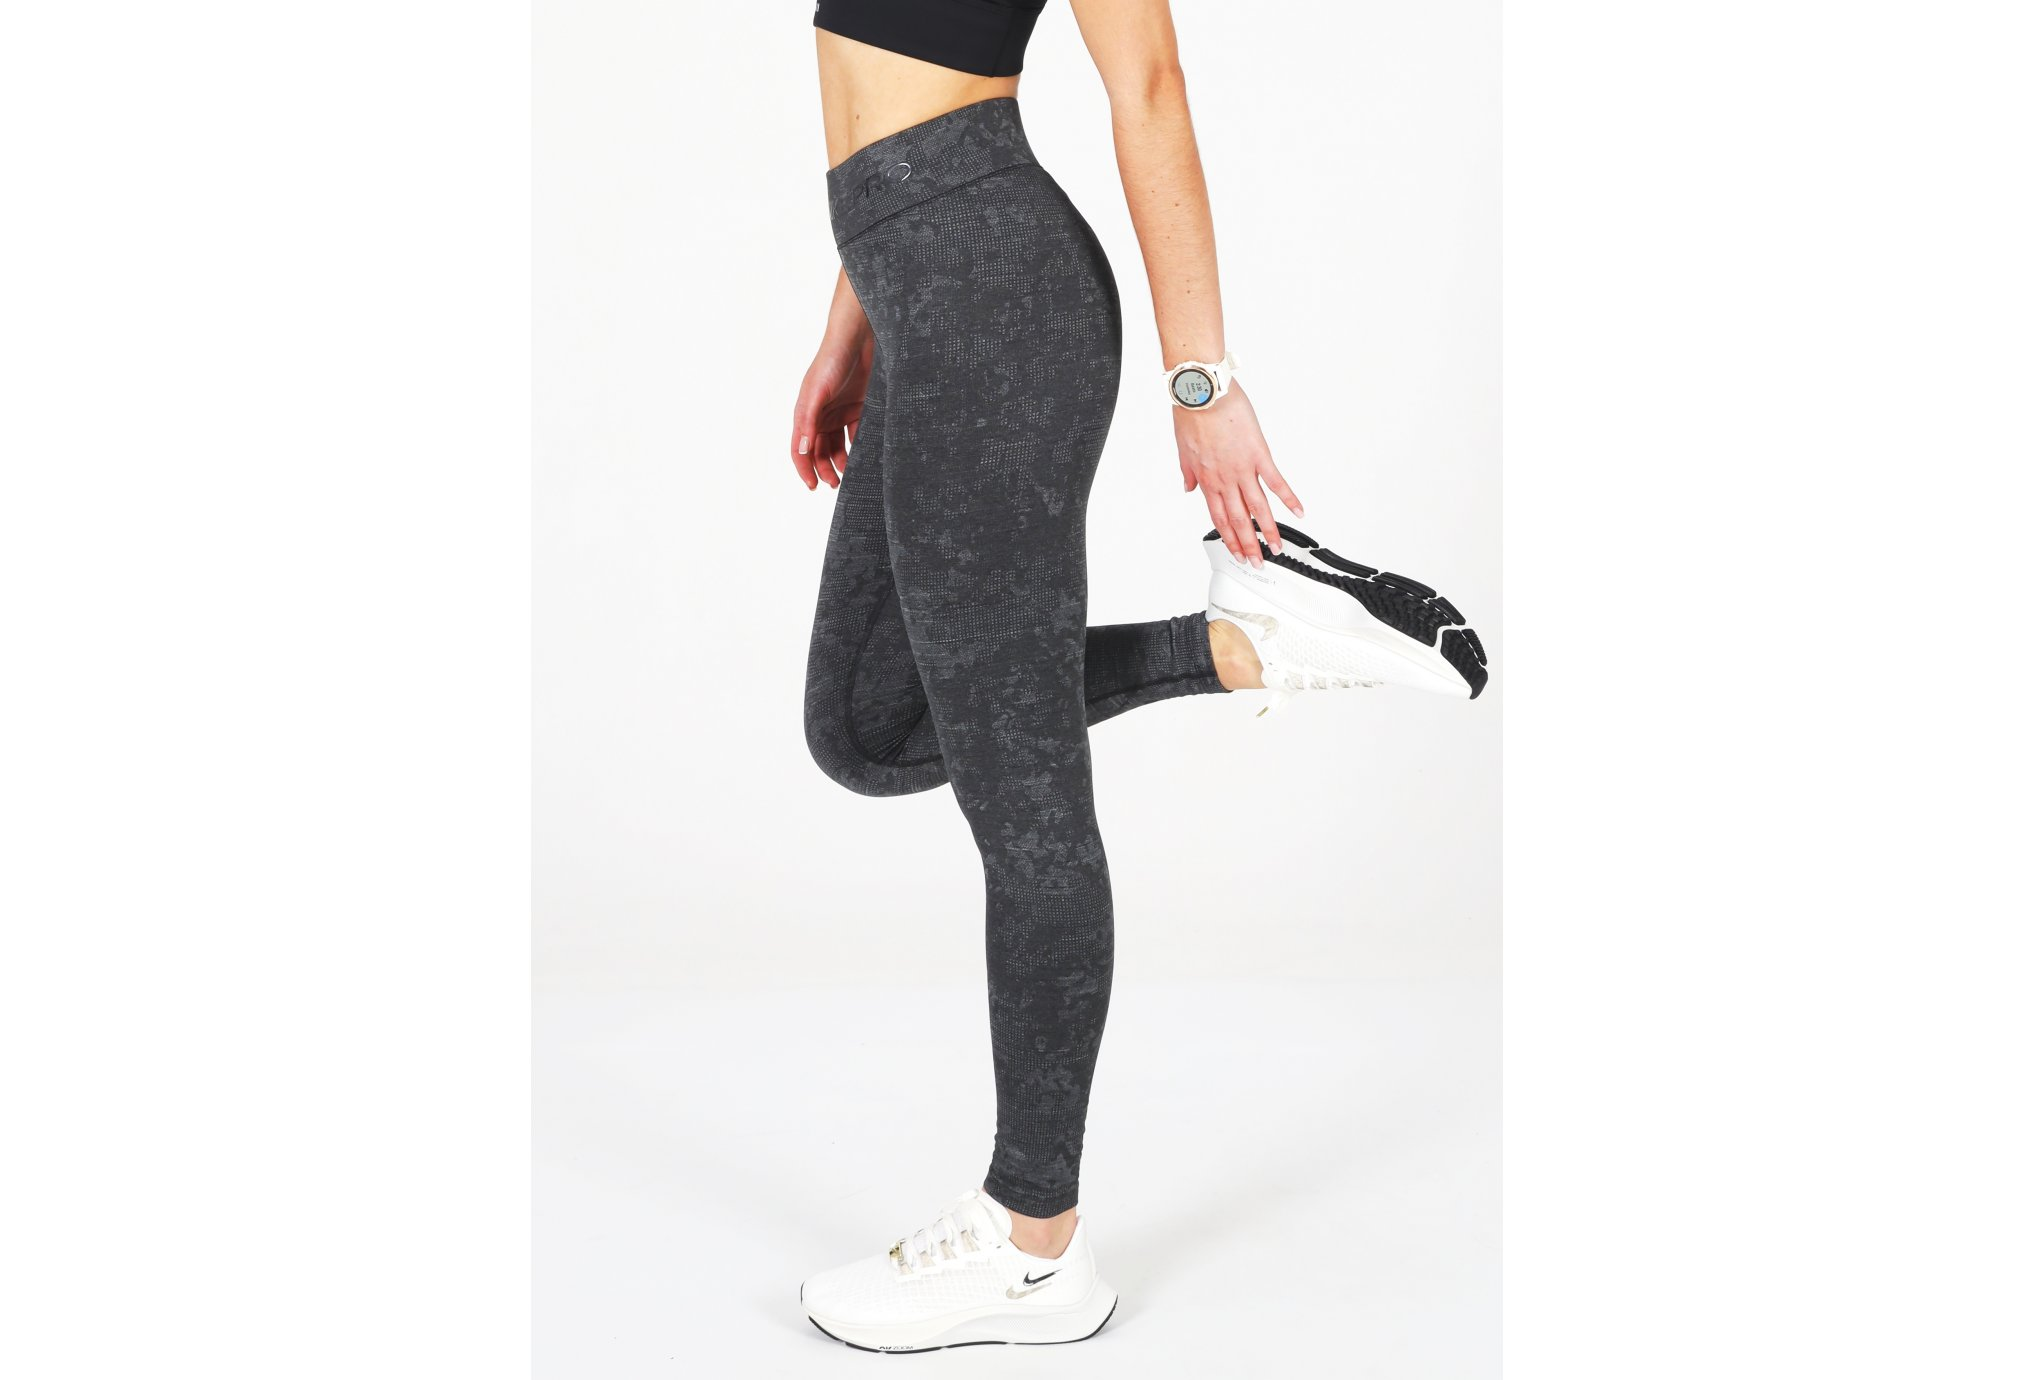 Nike Pro HyperWarm Therma W Diététique Vêtements femme